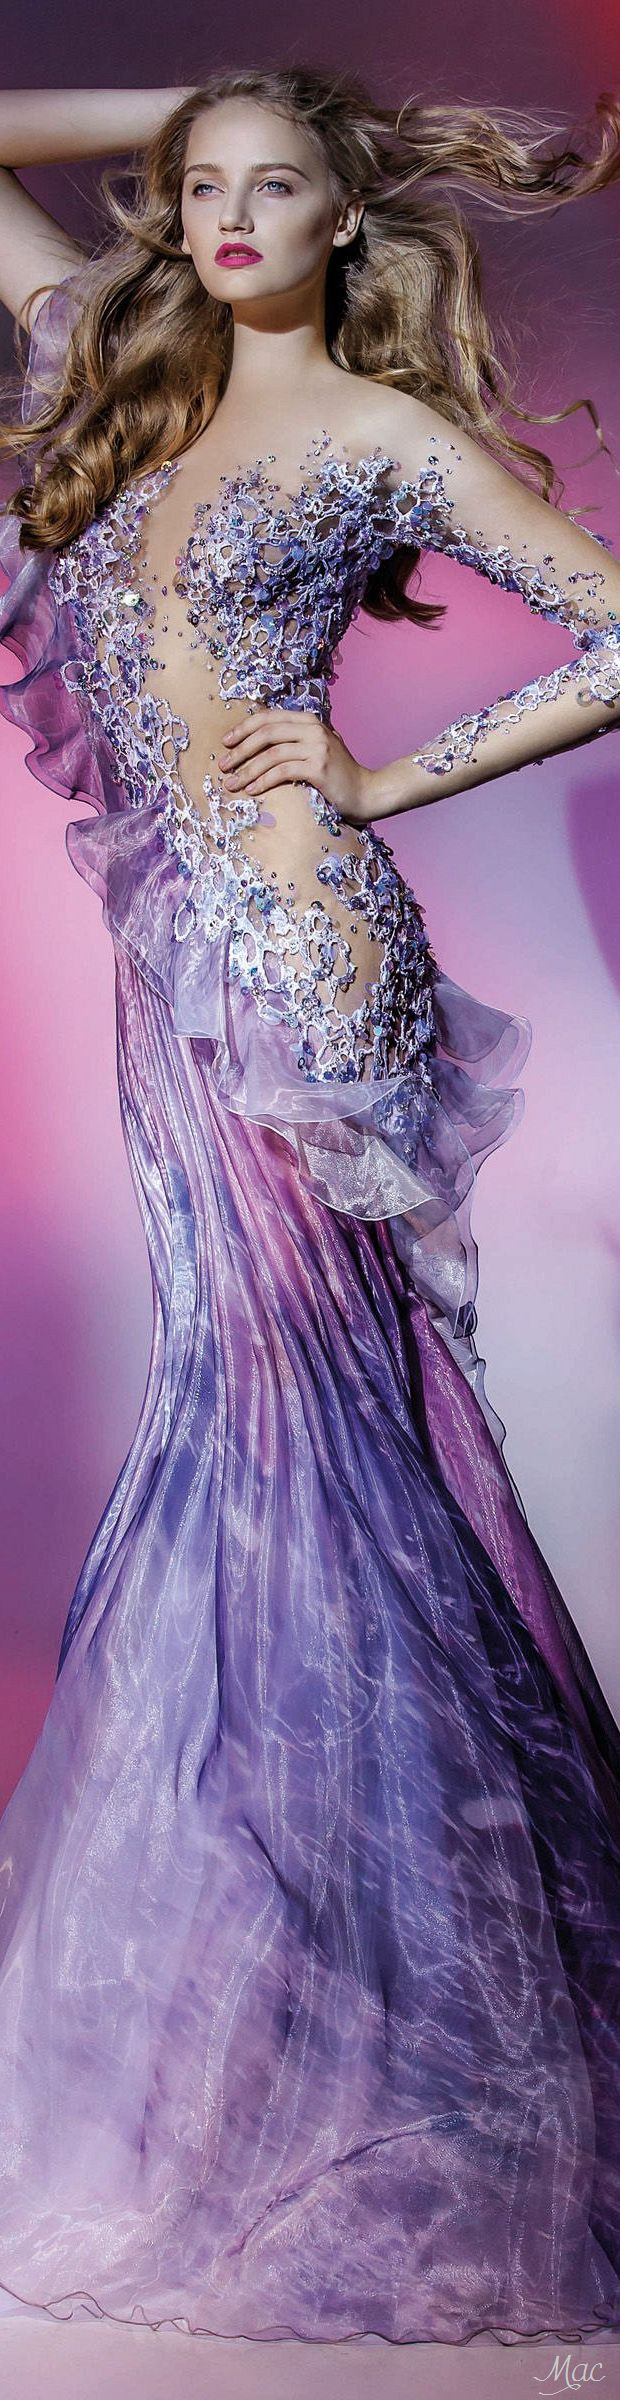 "Fall 2016 Haute Couture - Blanka Matragi ""Elements: Air"", 2017 Collection"